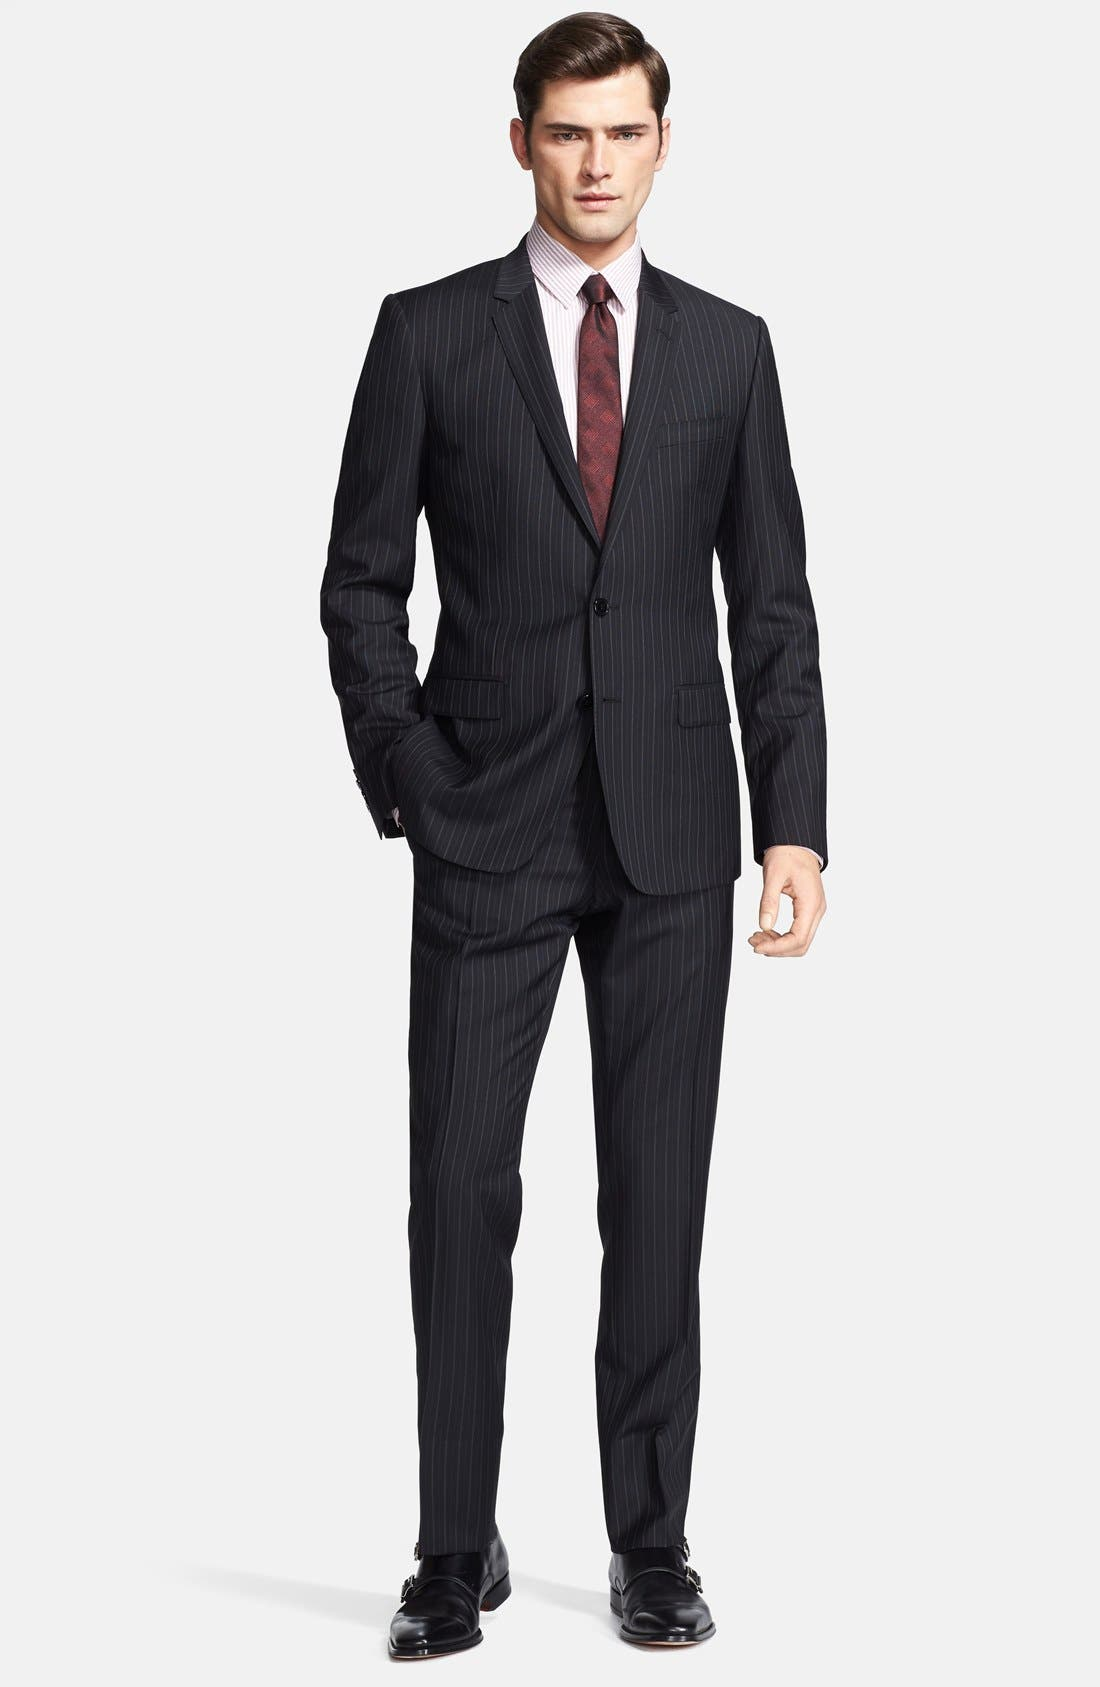 Alternate Image 1 Selected - Dolce&Gabbana 'Martini' Black Stripe Wool Suit